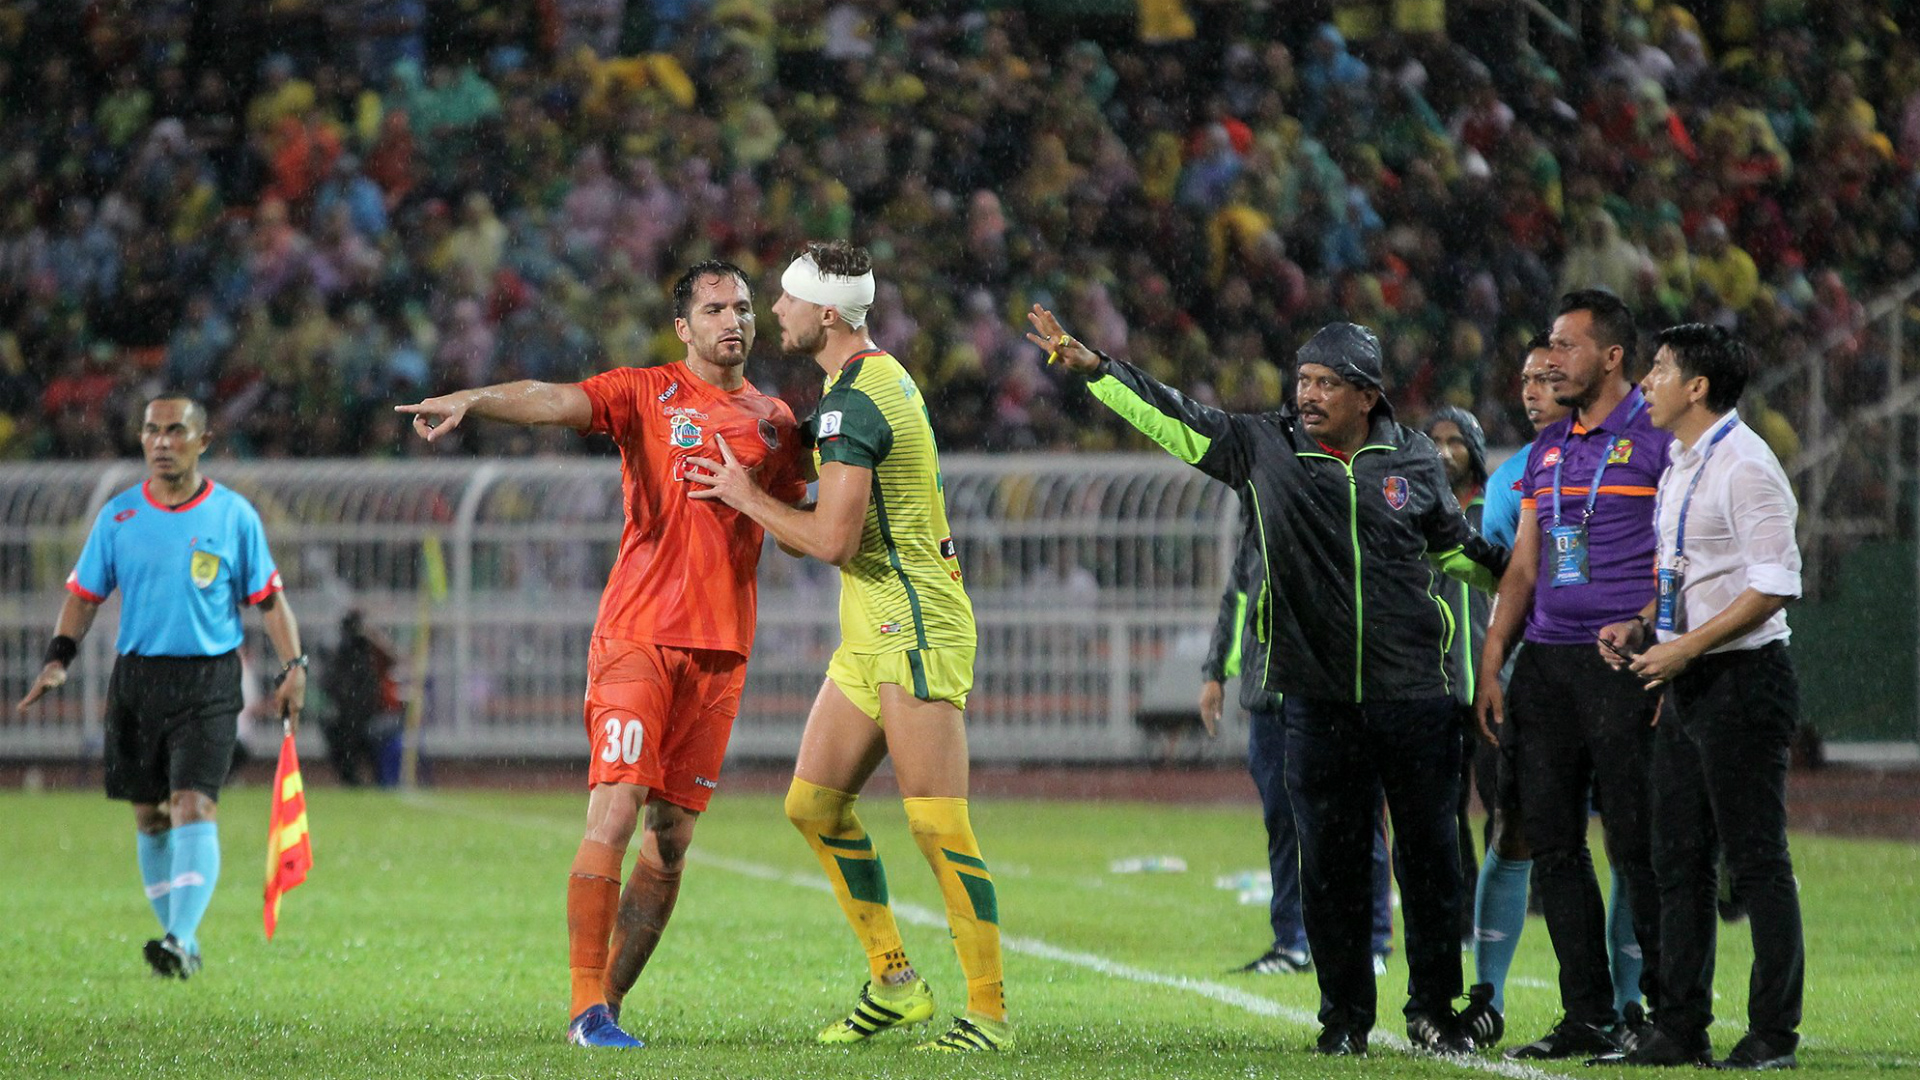 Zac Anderson, Kedah, Matias Hadwa, PKNS FC, Super League, 08/04/2017